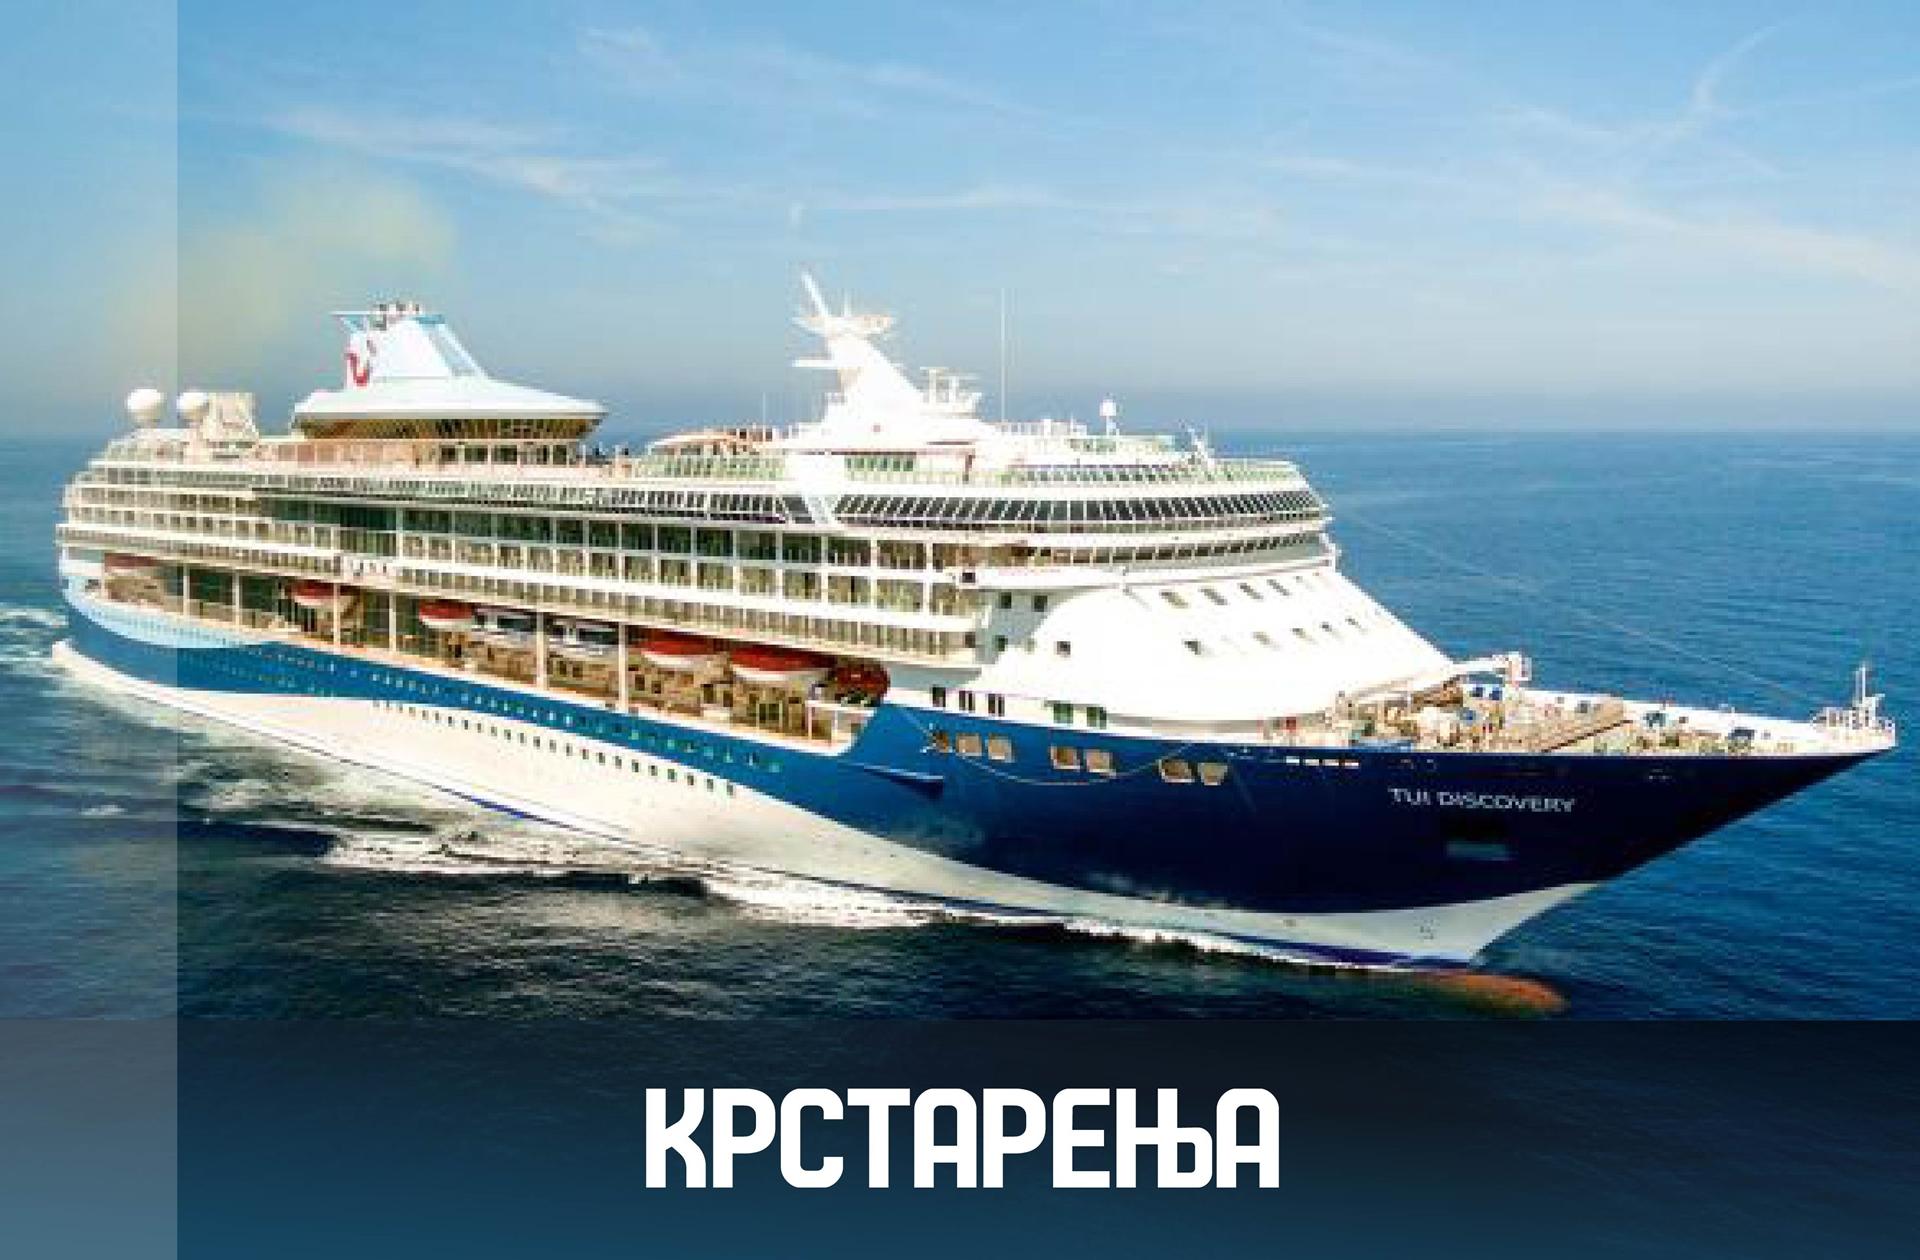 Нехар крстарења